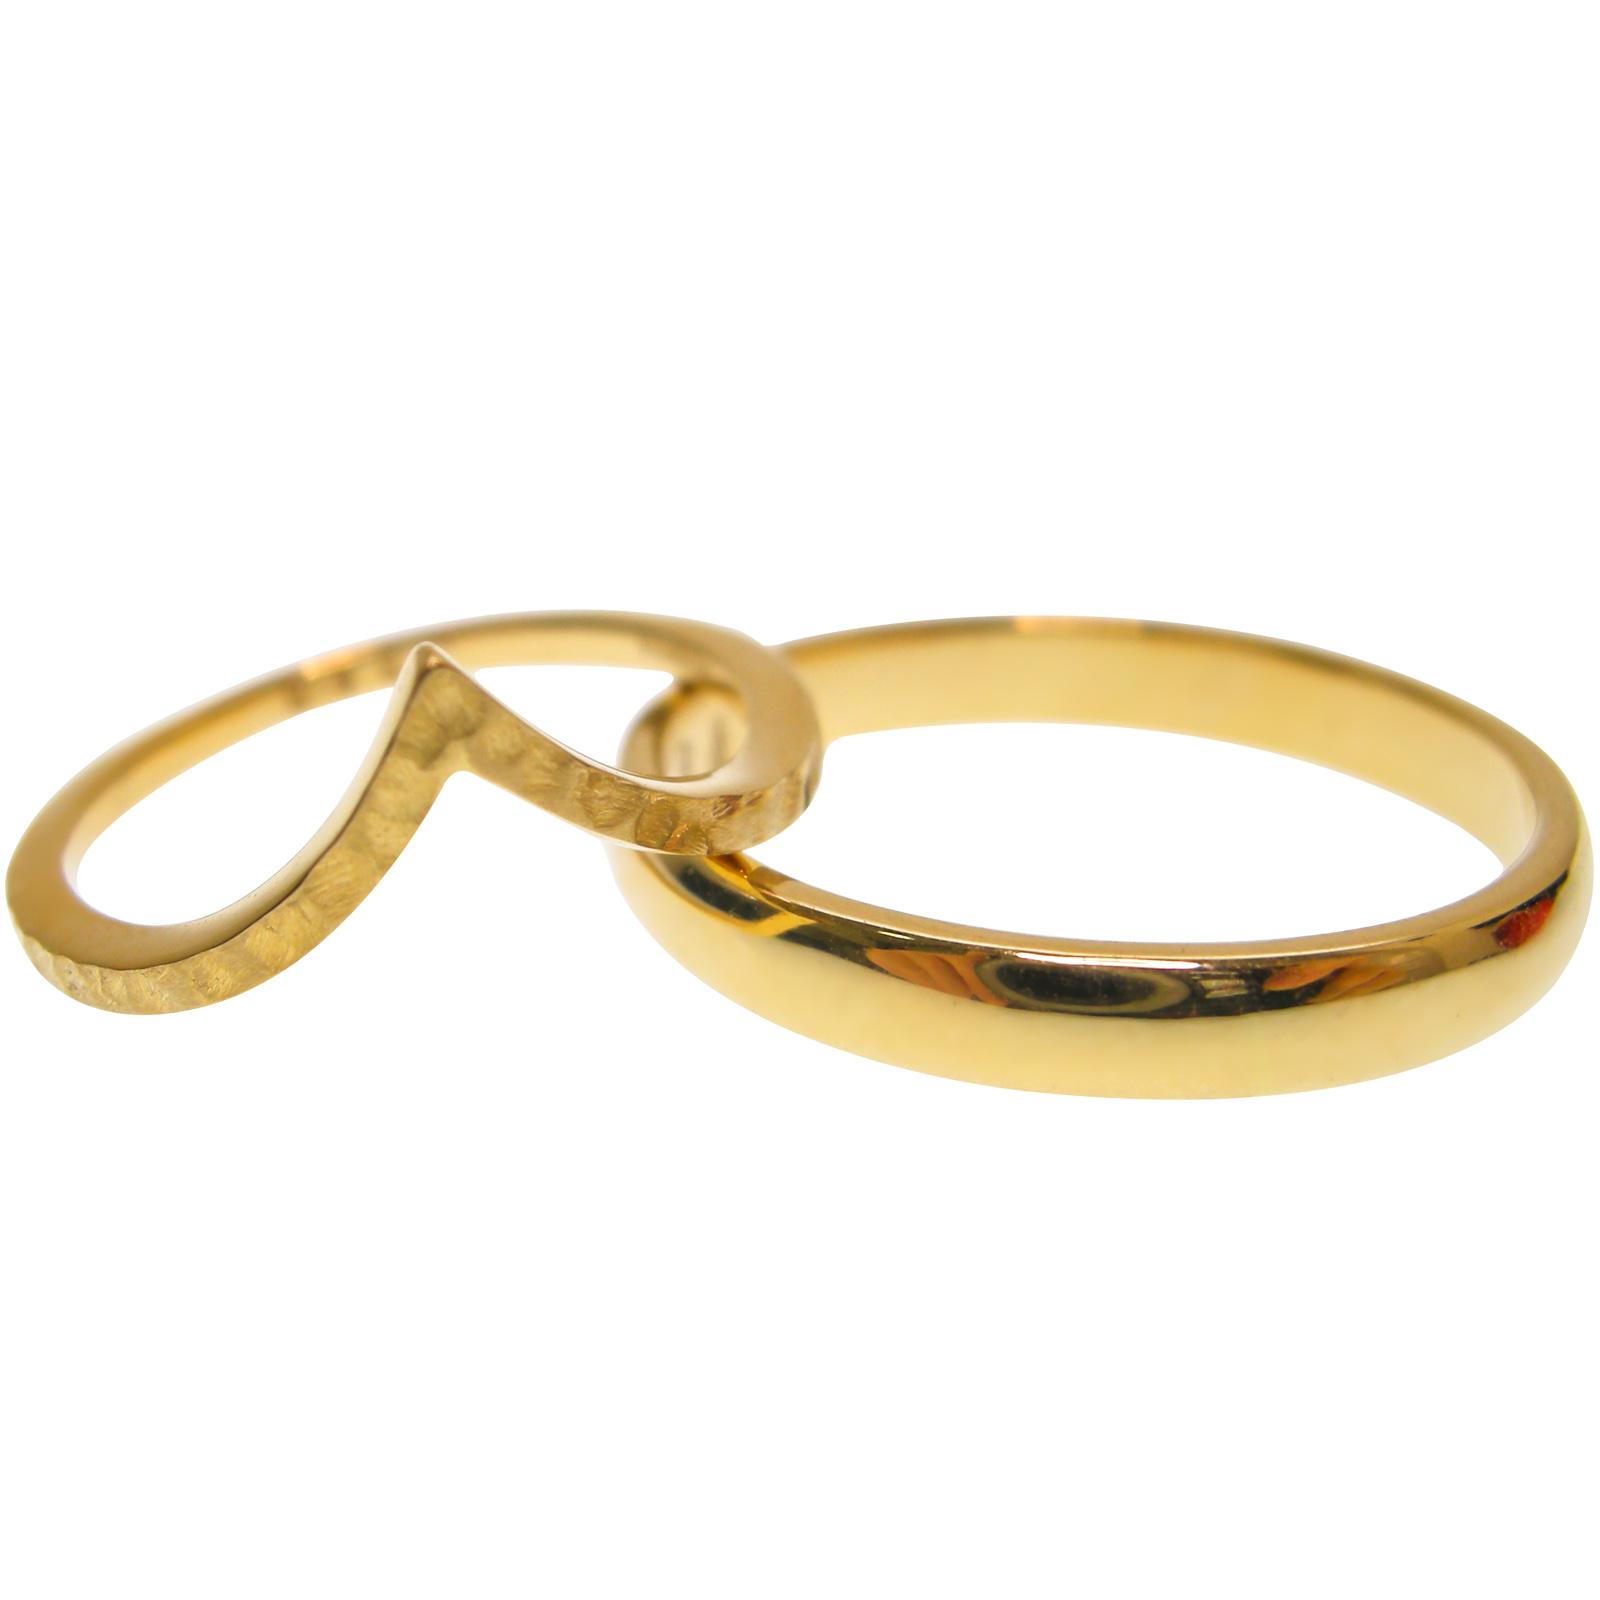 YELLOW GOLD WEDDING BAND SET BESPOKE FINE JEWELLERY BY SHAHINA HATTA